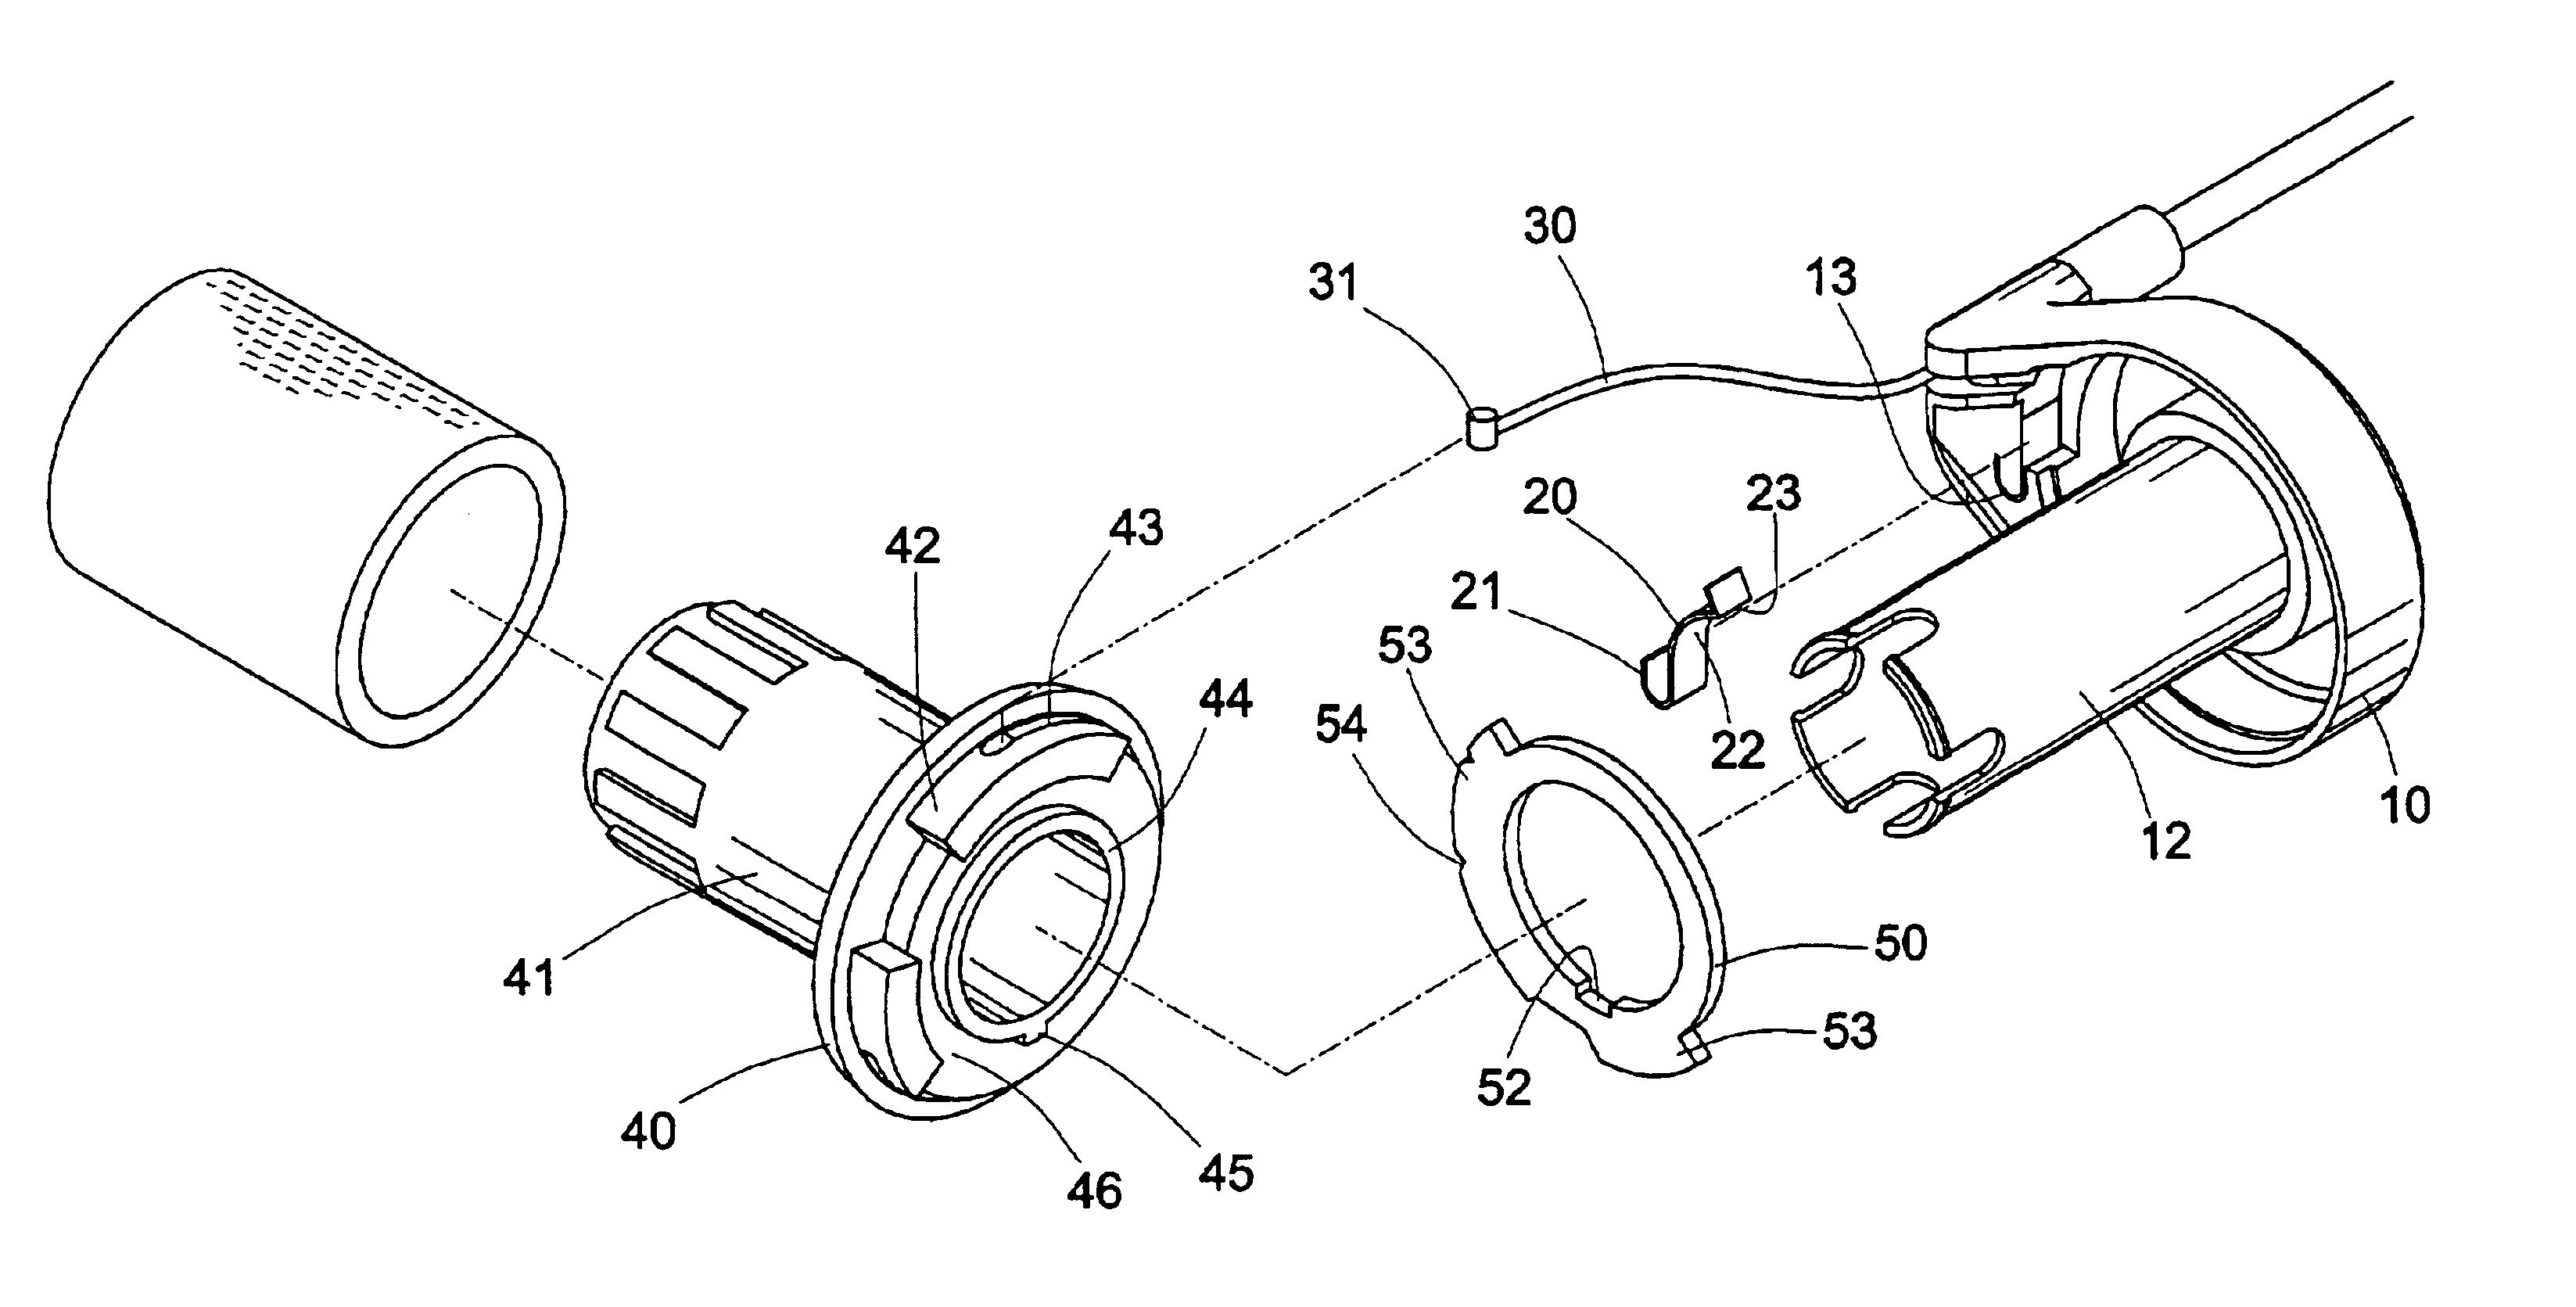 bike parts diagram 2001 honda civic alternator wiring handlebar shifter device for operating bicycle derailleur